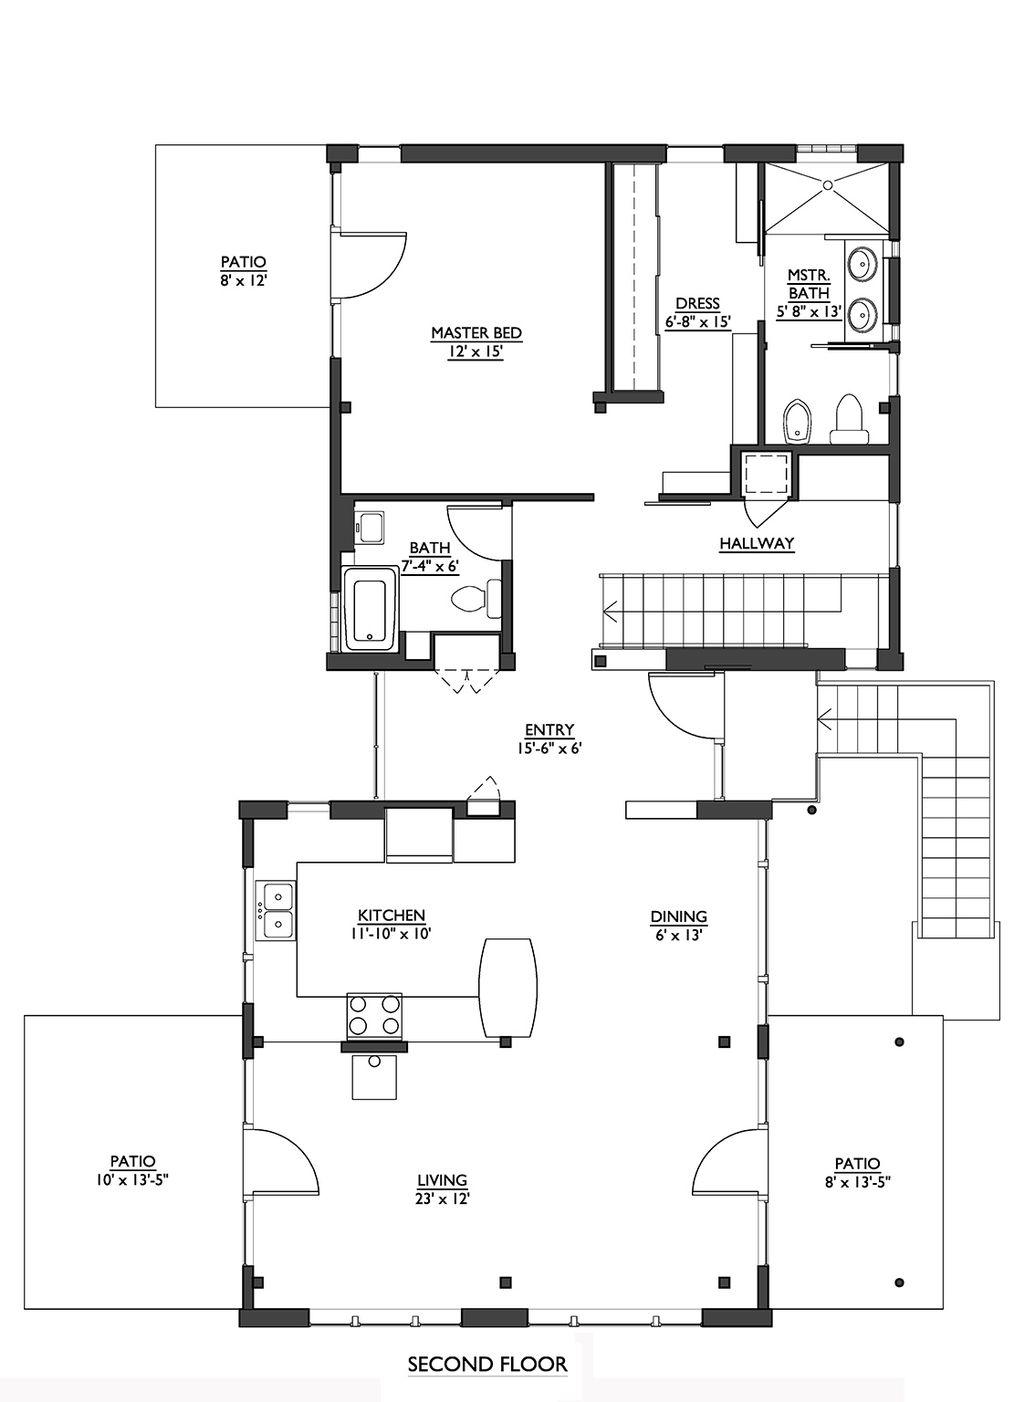 modern style house plan 2 beds 2 5 baths 1953 sq ft plan 890 6modern style house plan 2 beds 2 5 baths 1953 sq ft plan 890